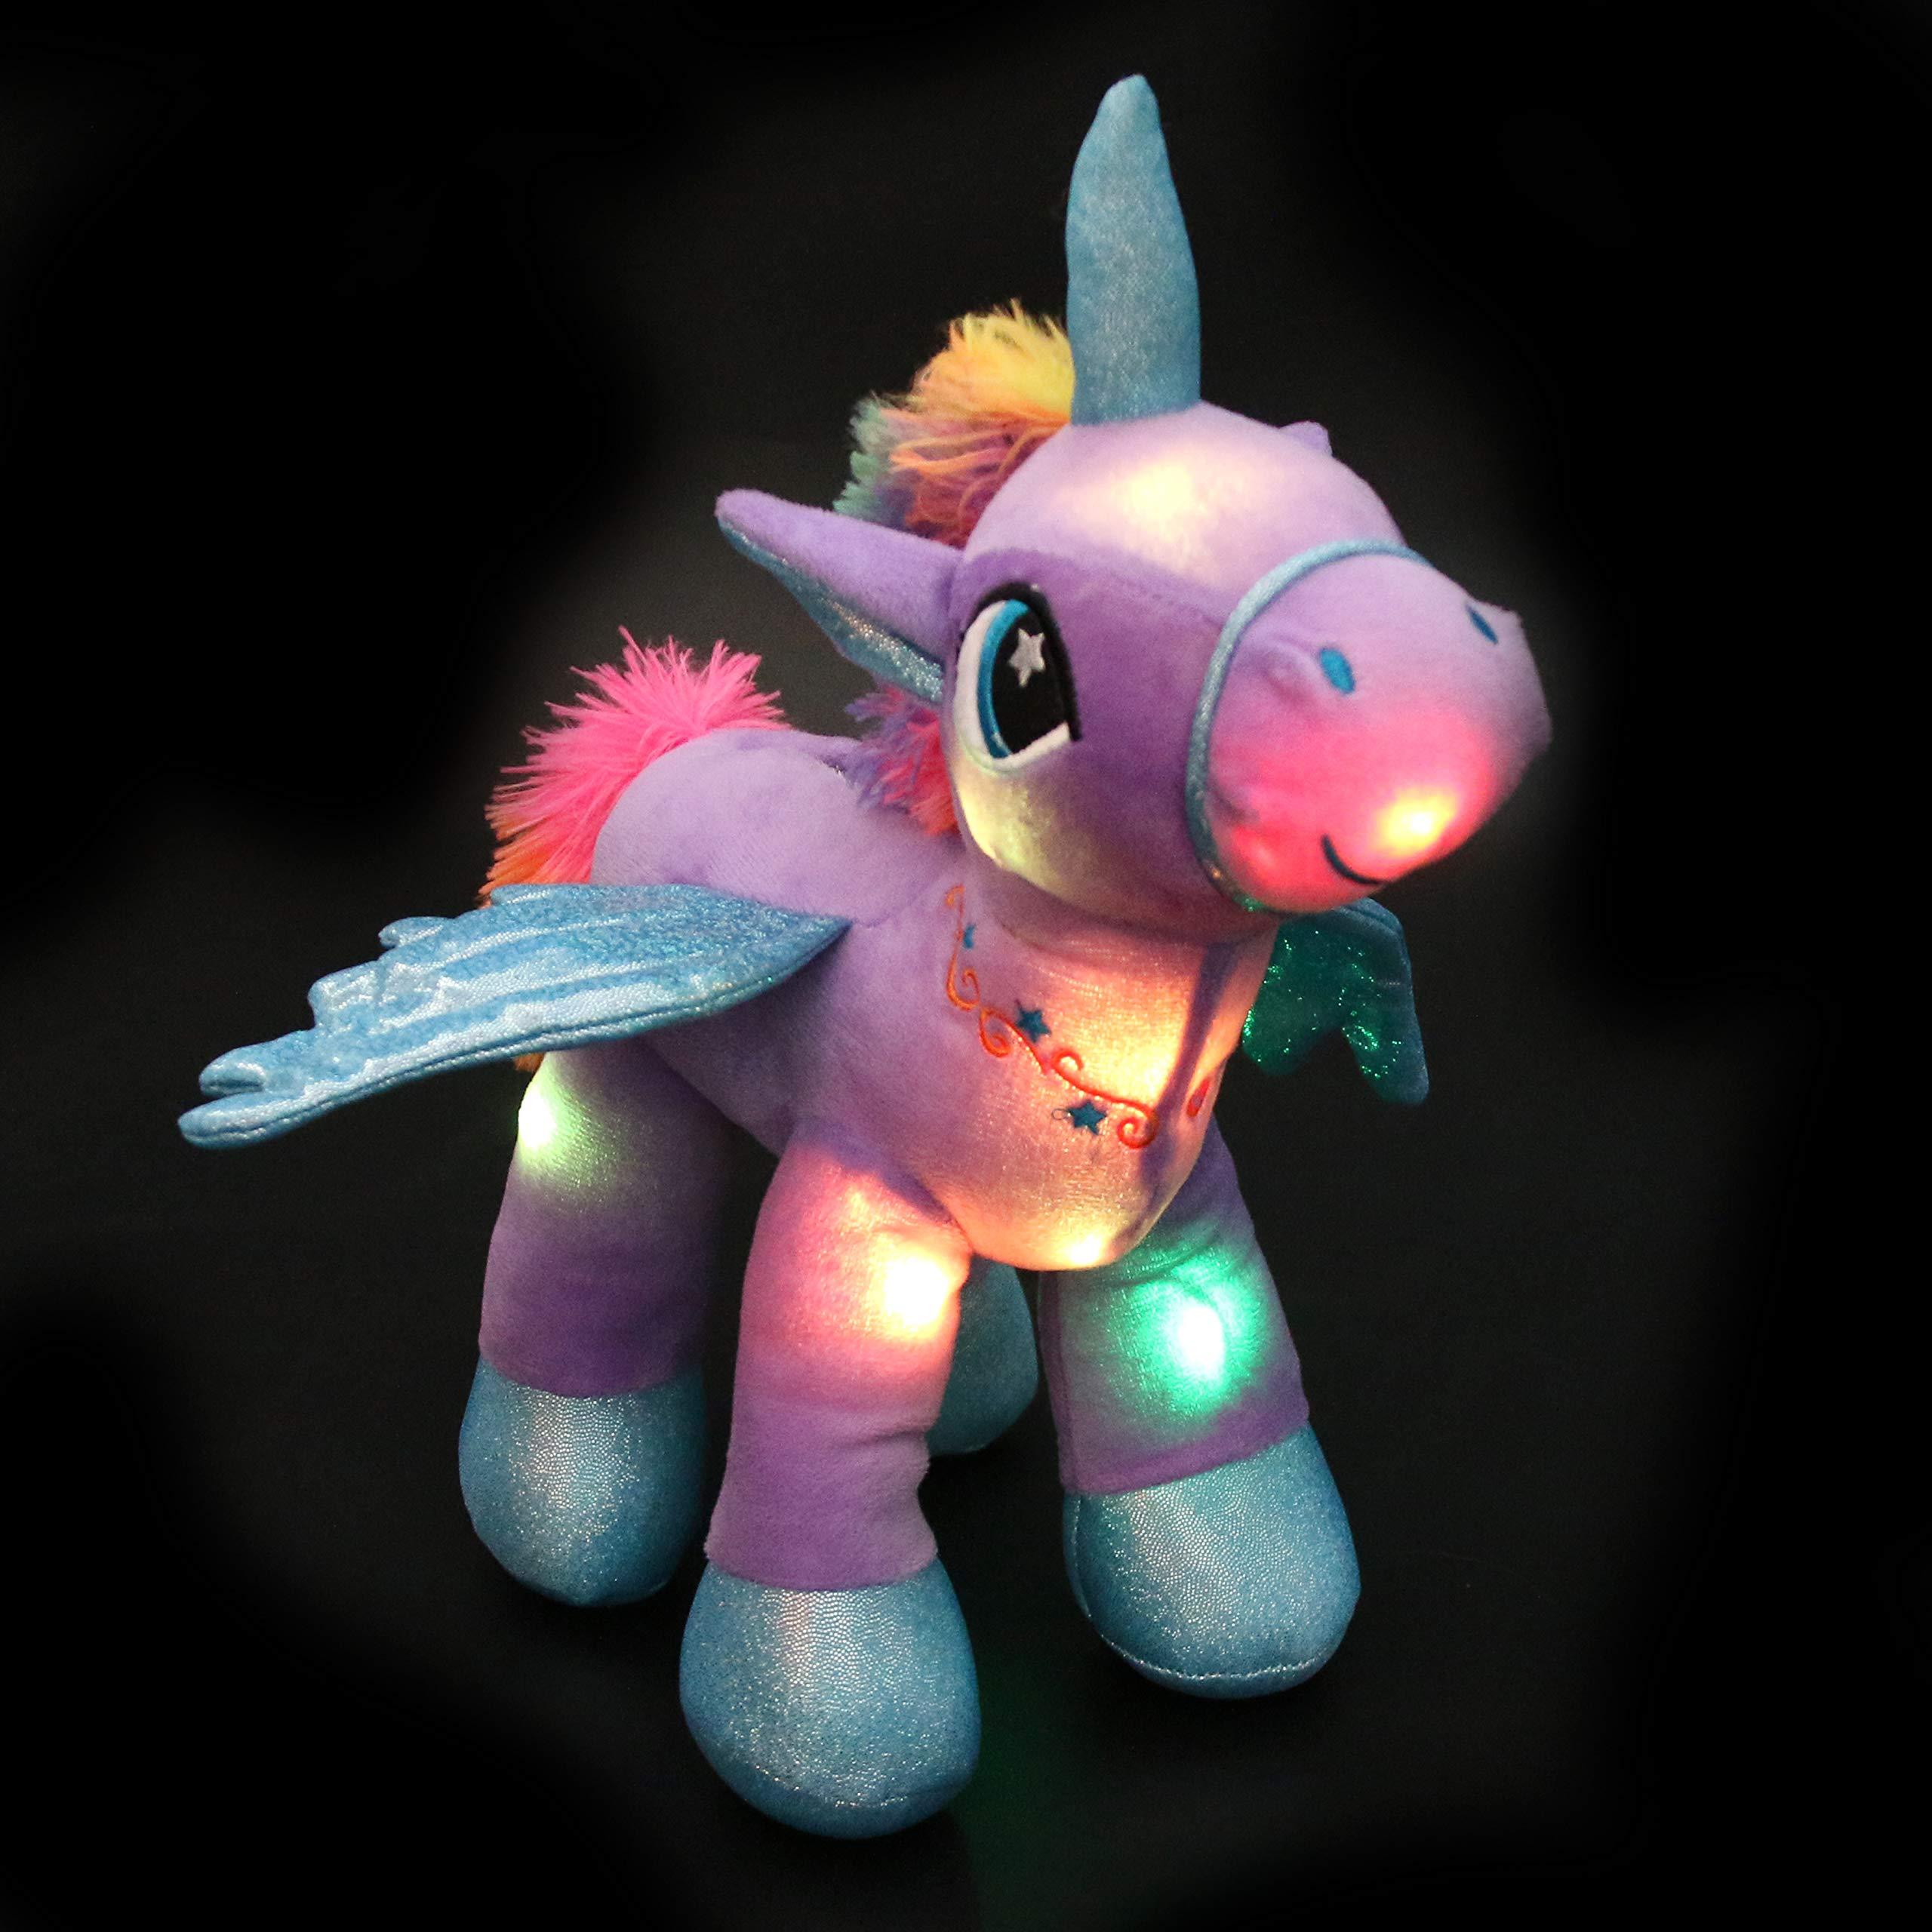 Houwsbaby Glow Unicorn Light Up Stuffed Animal Soft LED Horse Plush Toy Glitter Gift for Kids Boys Girls Companion Pet Holiday Birthday, 14'' (Purple)